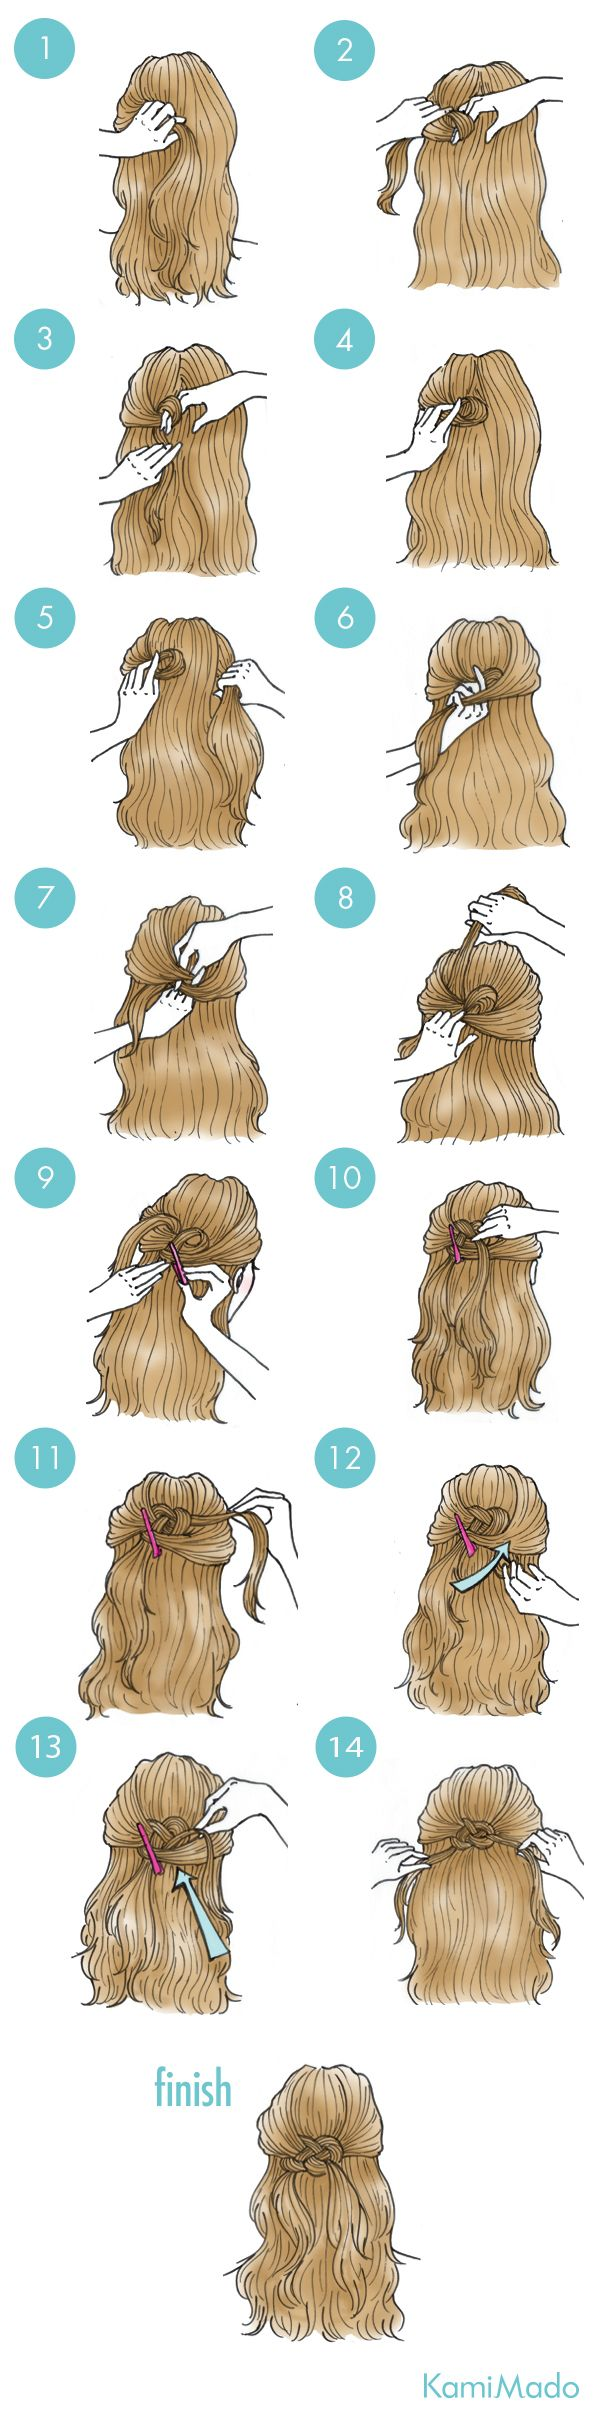 Kamimado dozens of japanese hair tutorials with stepbystep